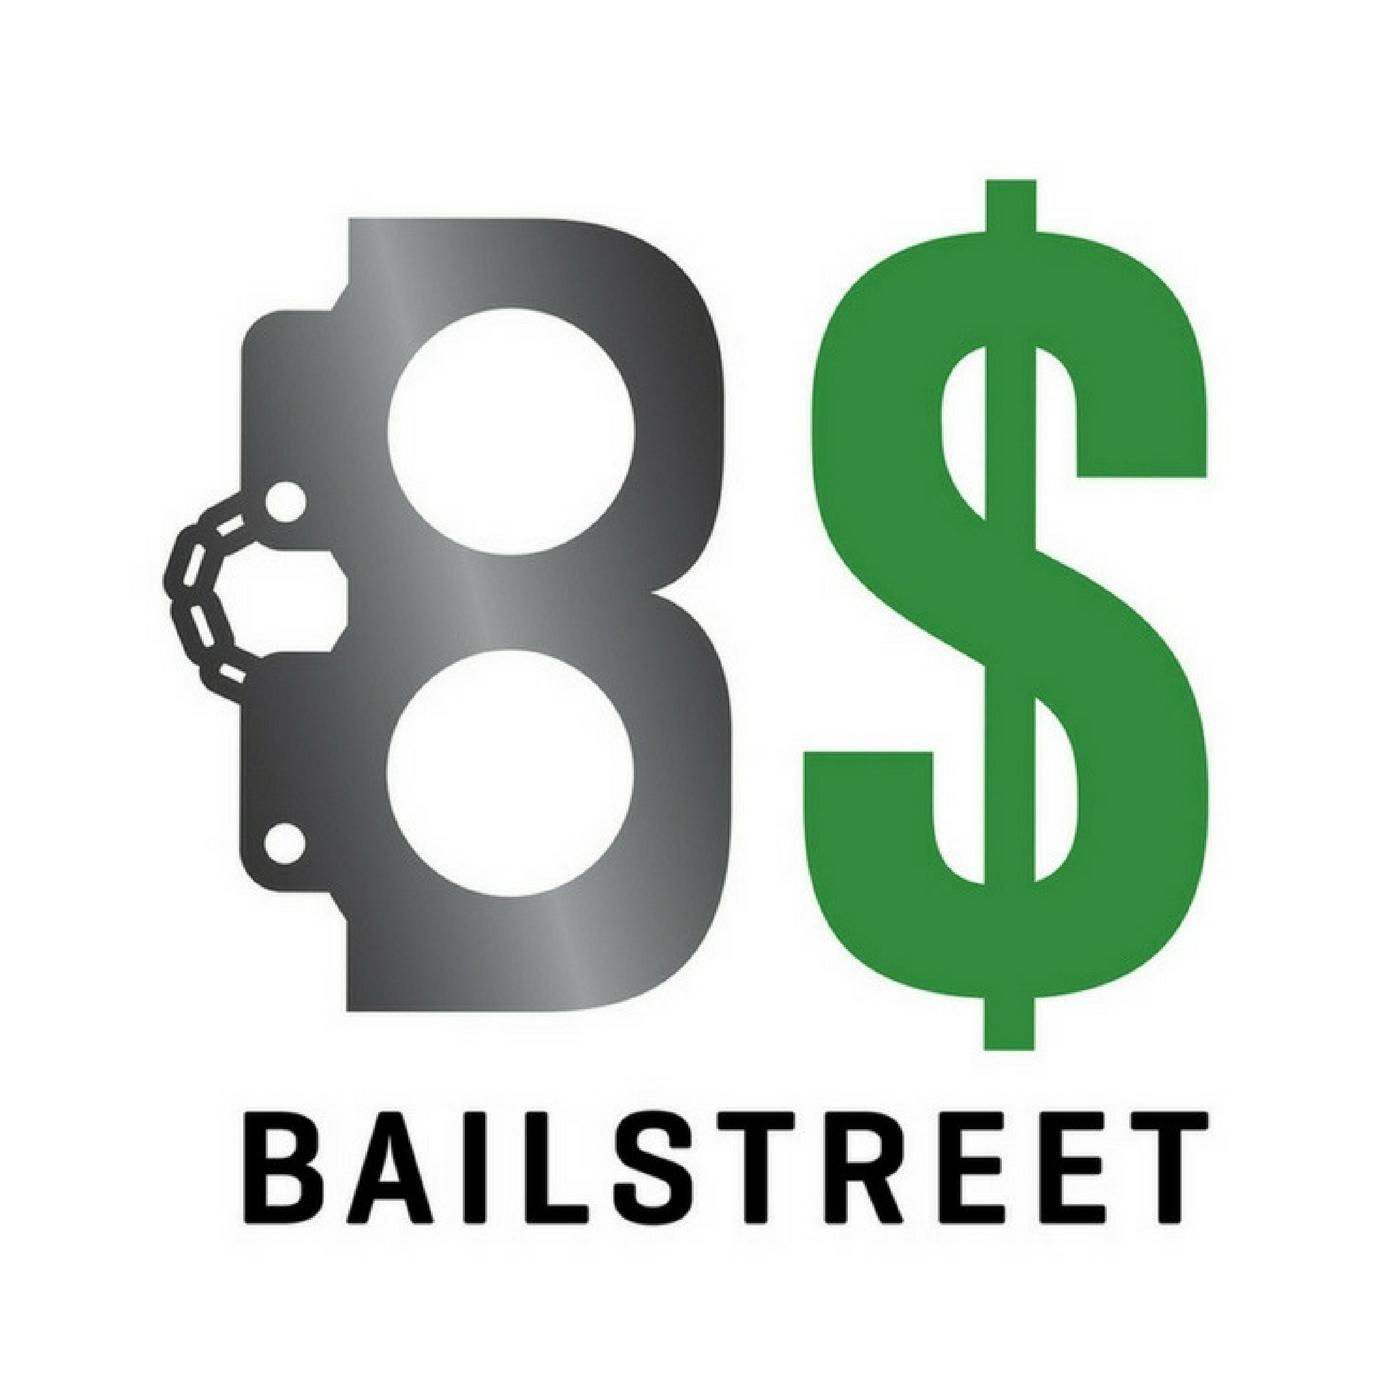 BAILSTREET